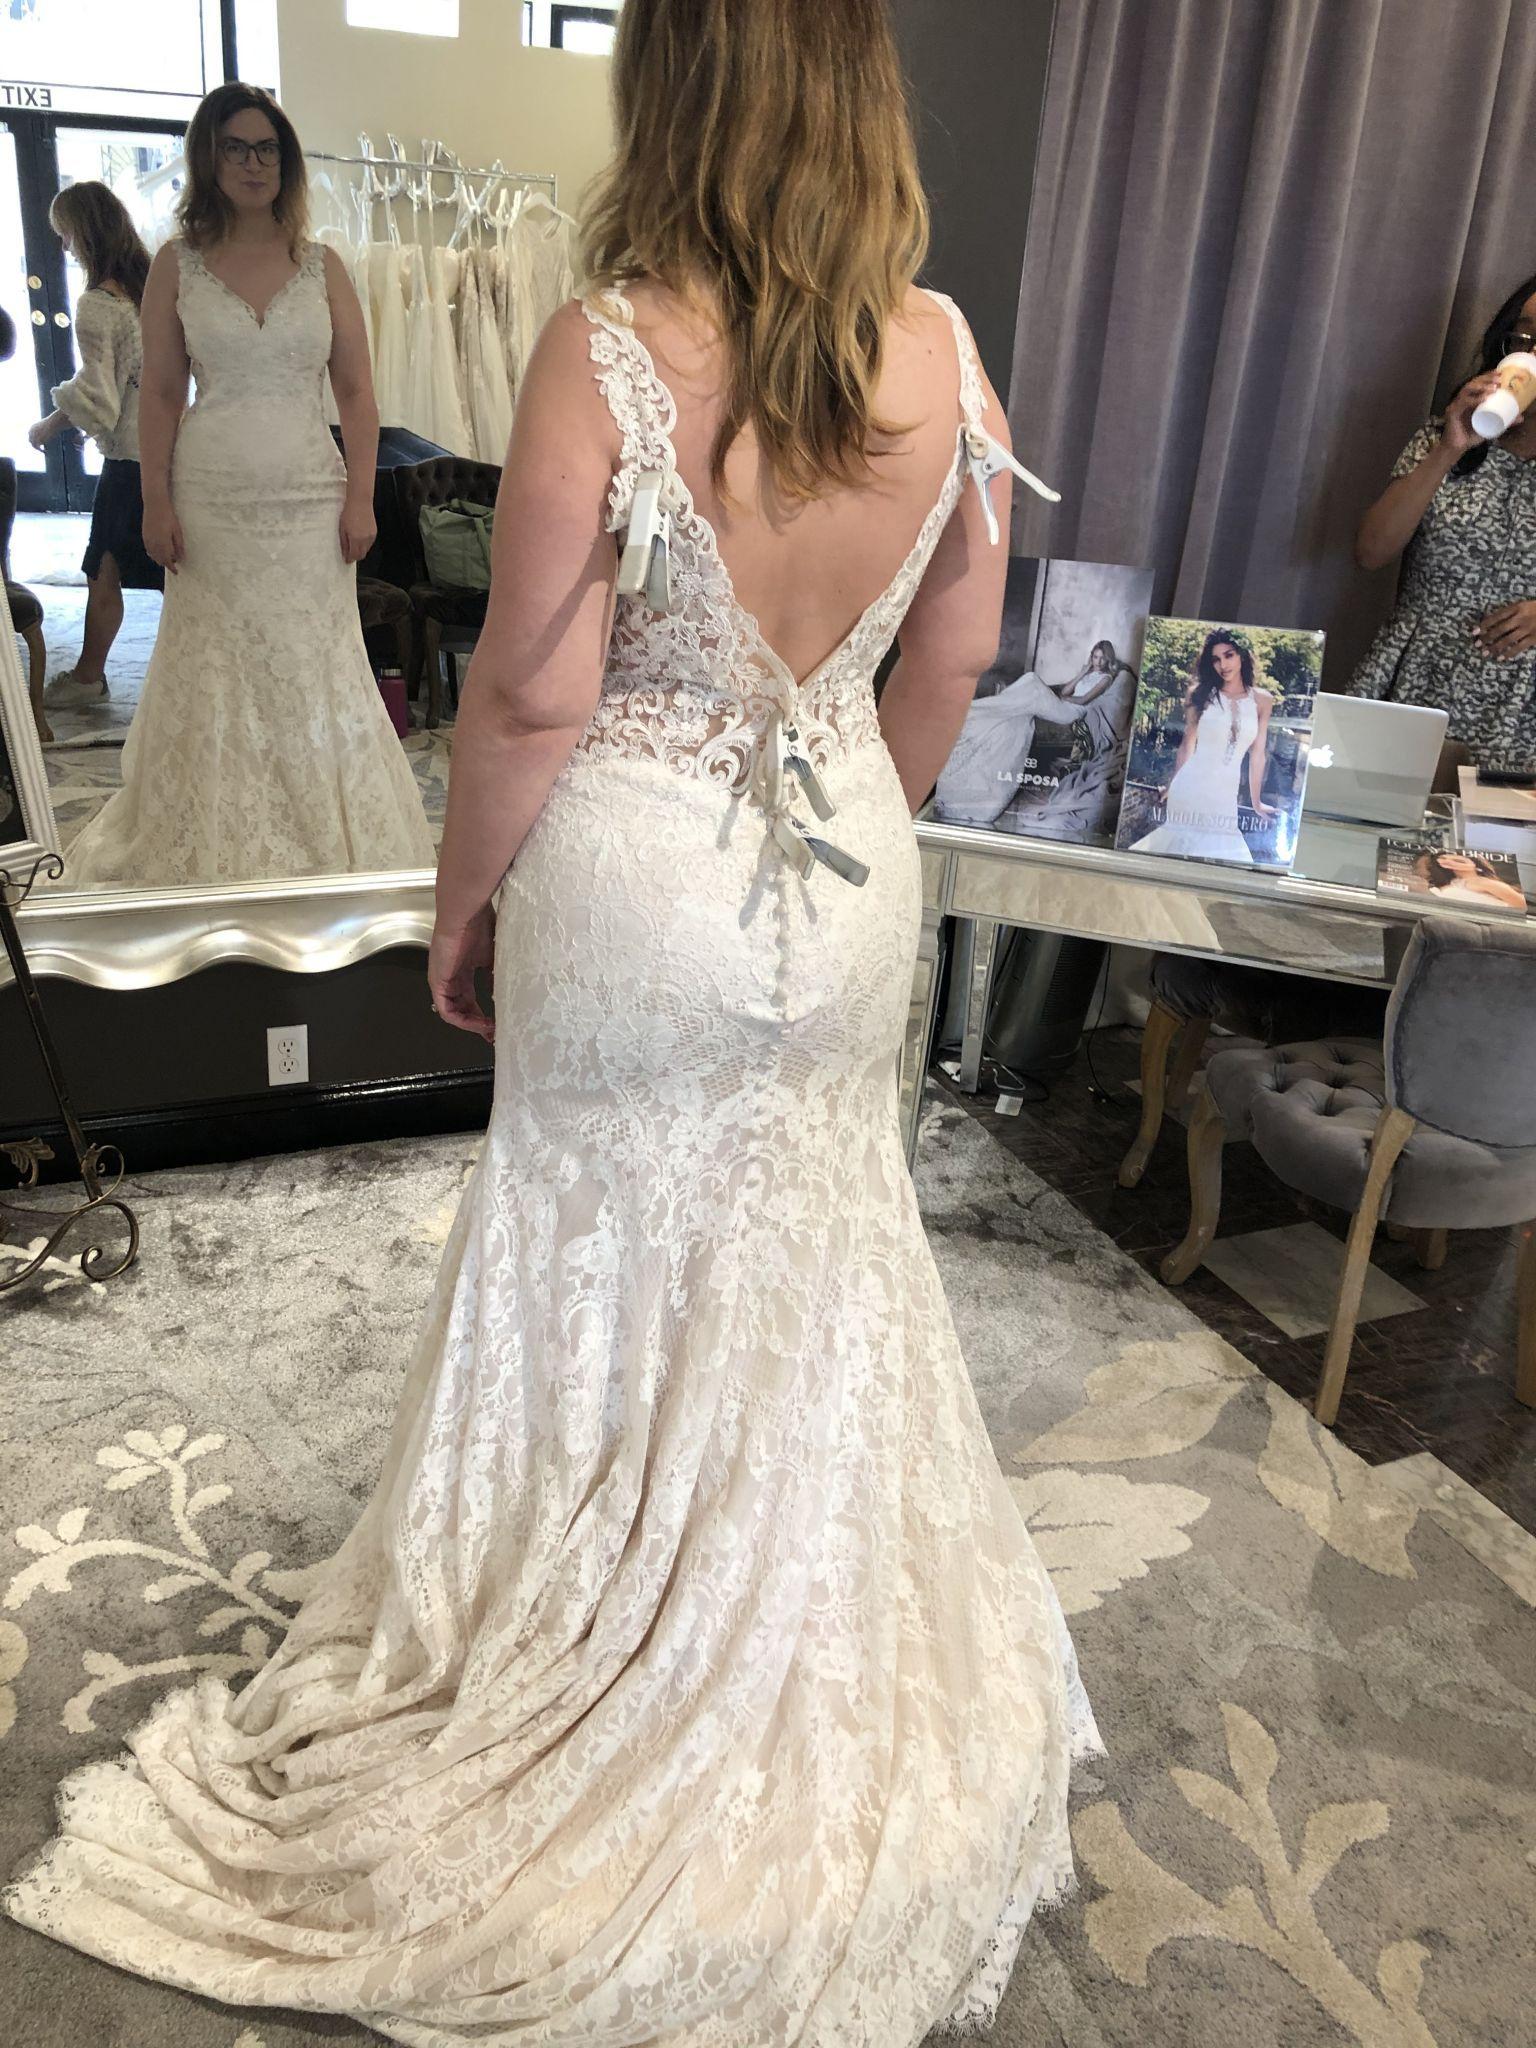 Allure Bridals 9412 Wedding Dress Sample Size 18 600 Allure Bridal Wedding Dresses Dresses [ 2048 x 1536 Pixel ]